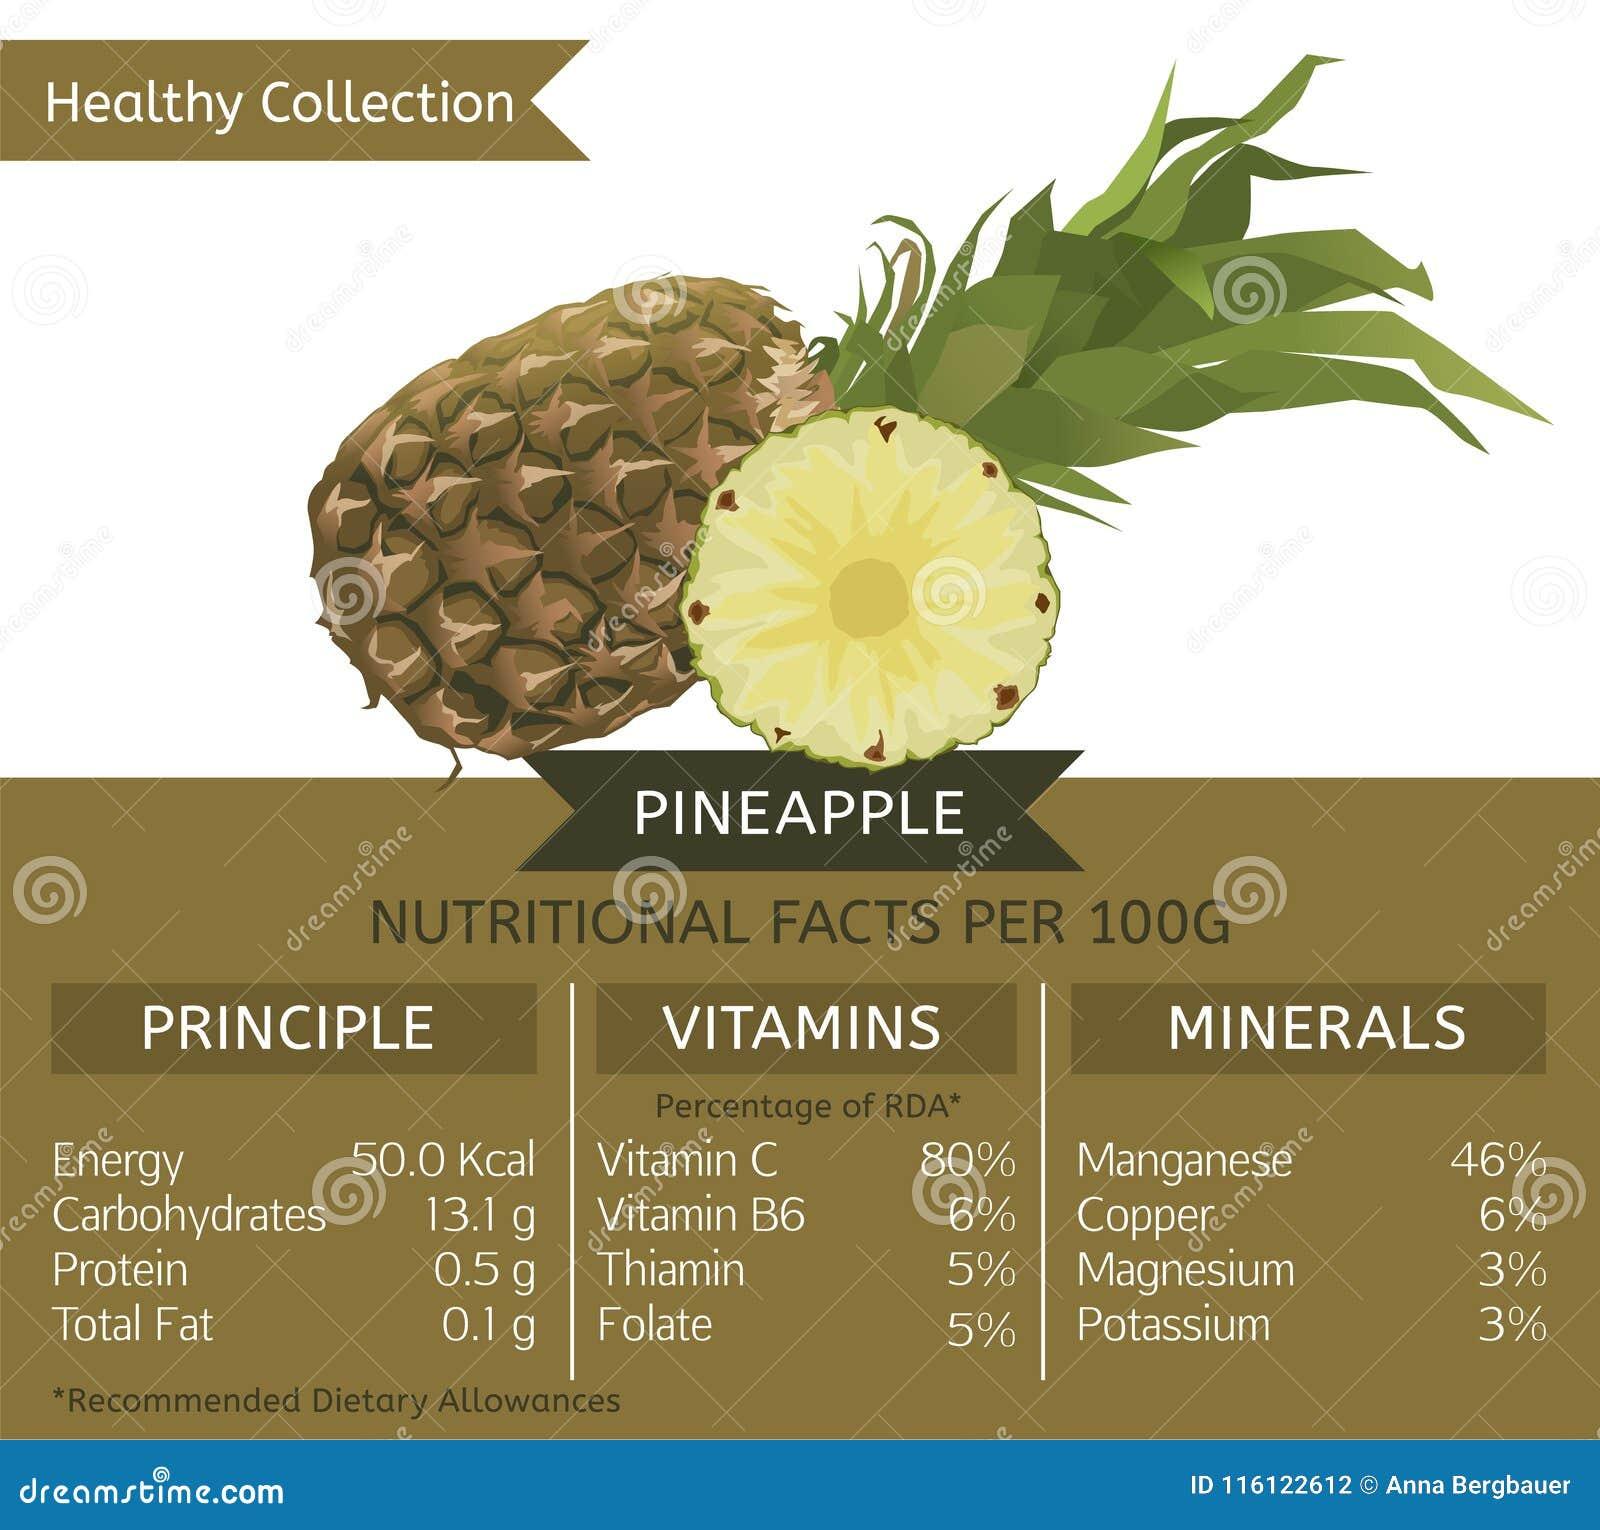 ananas c vitamin